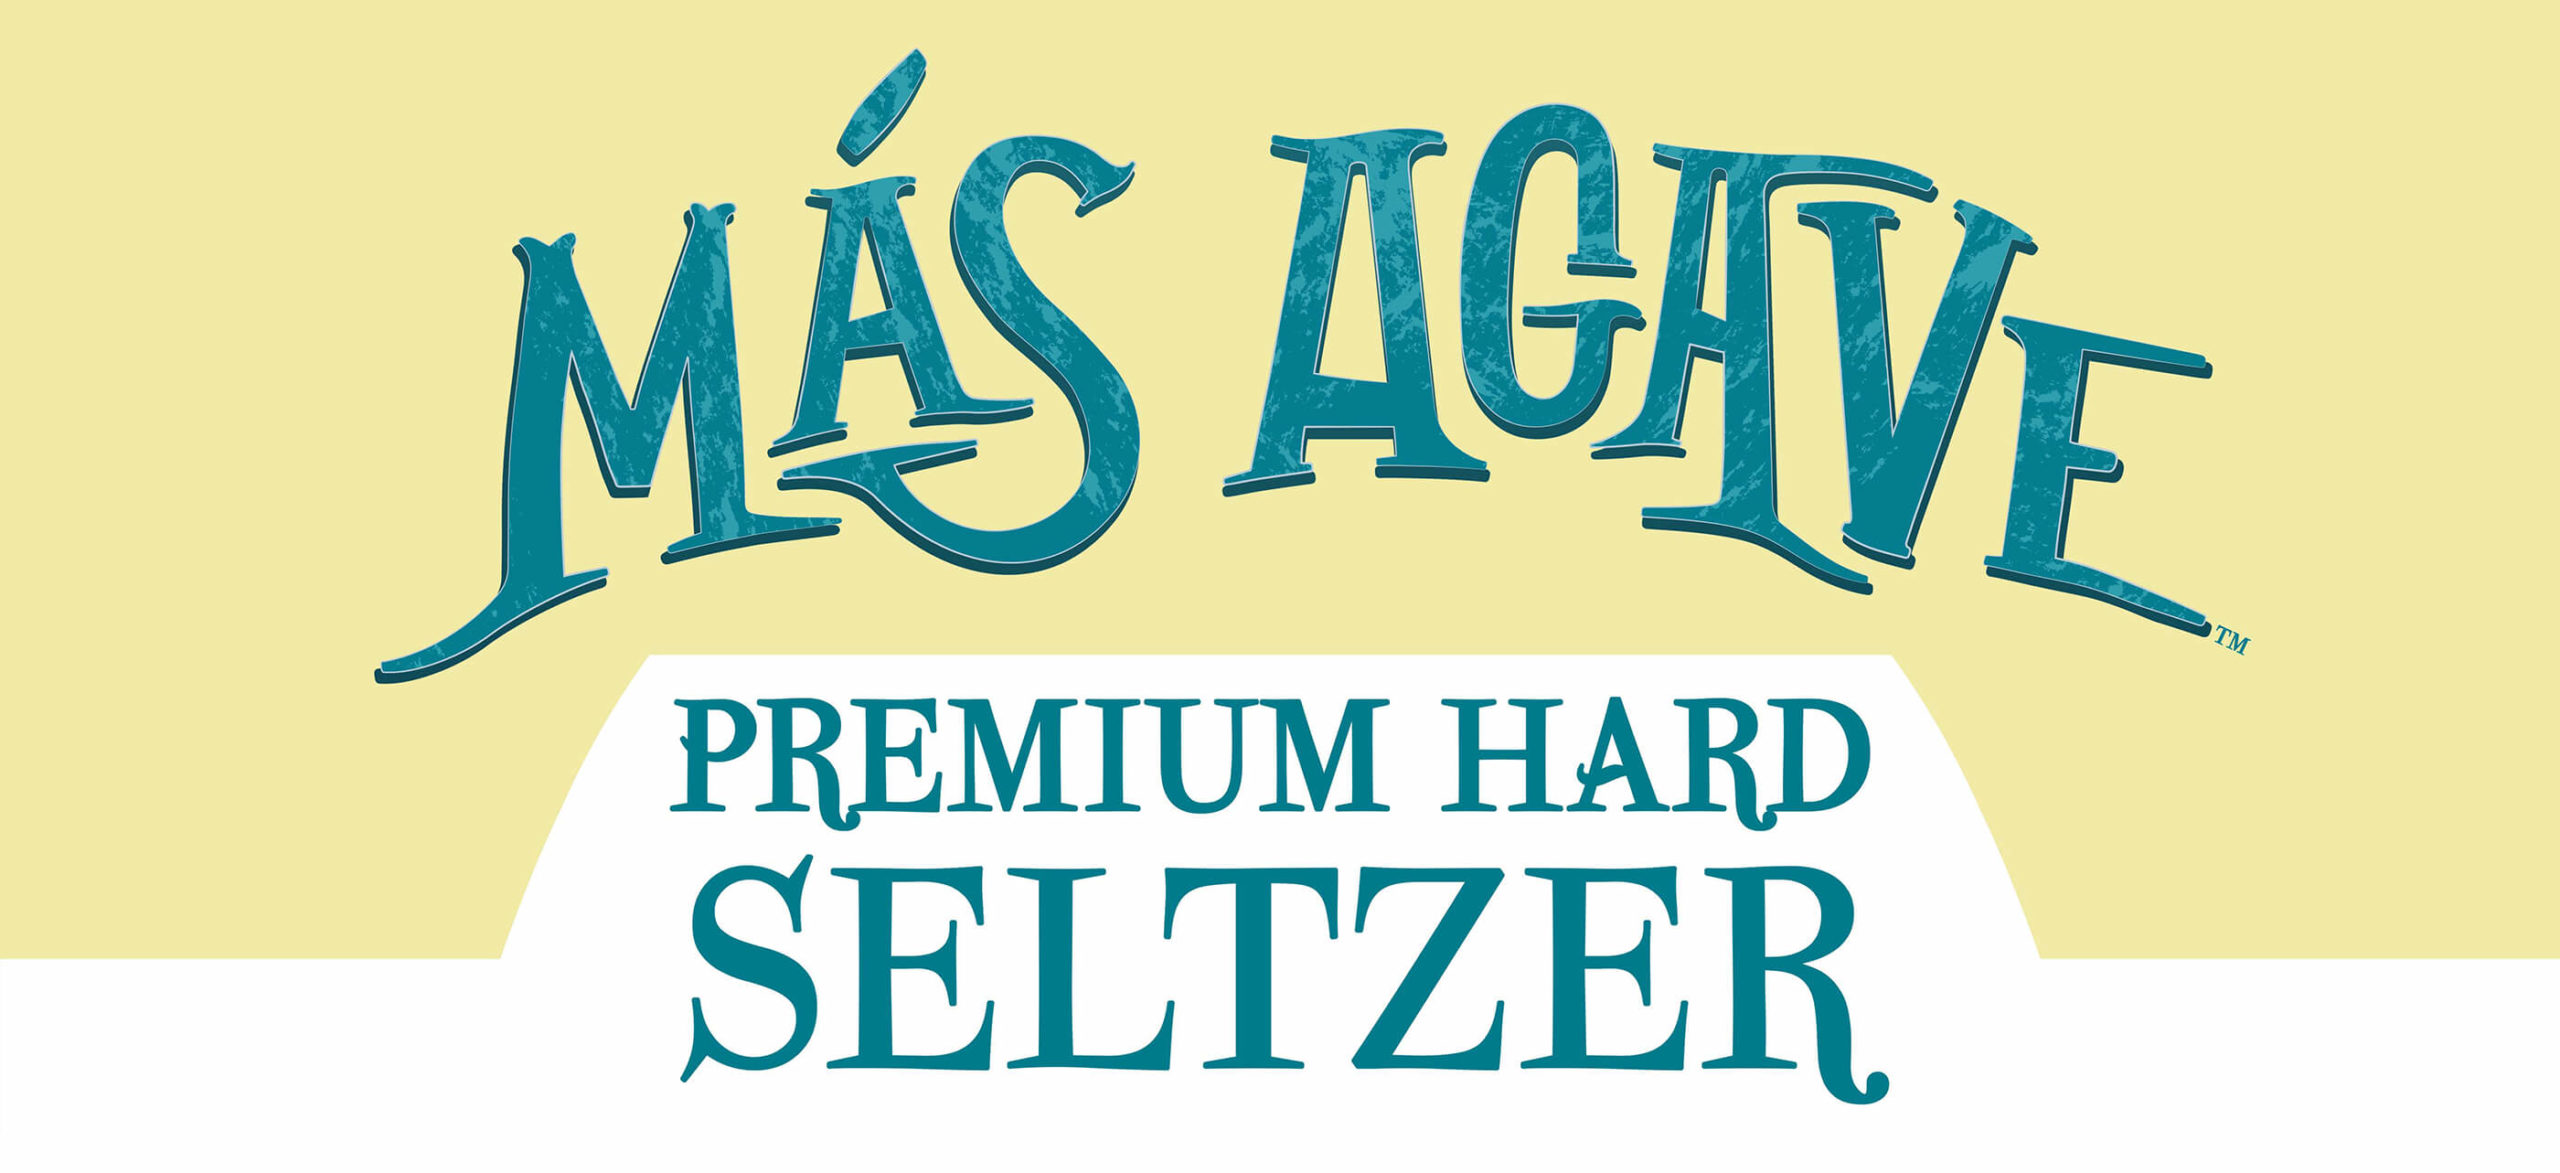 Founders Mas Avage Premium Hard Seltzer